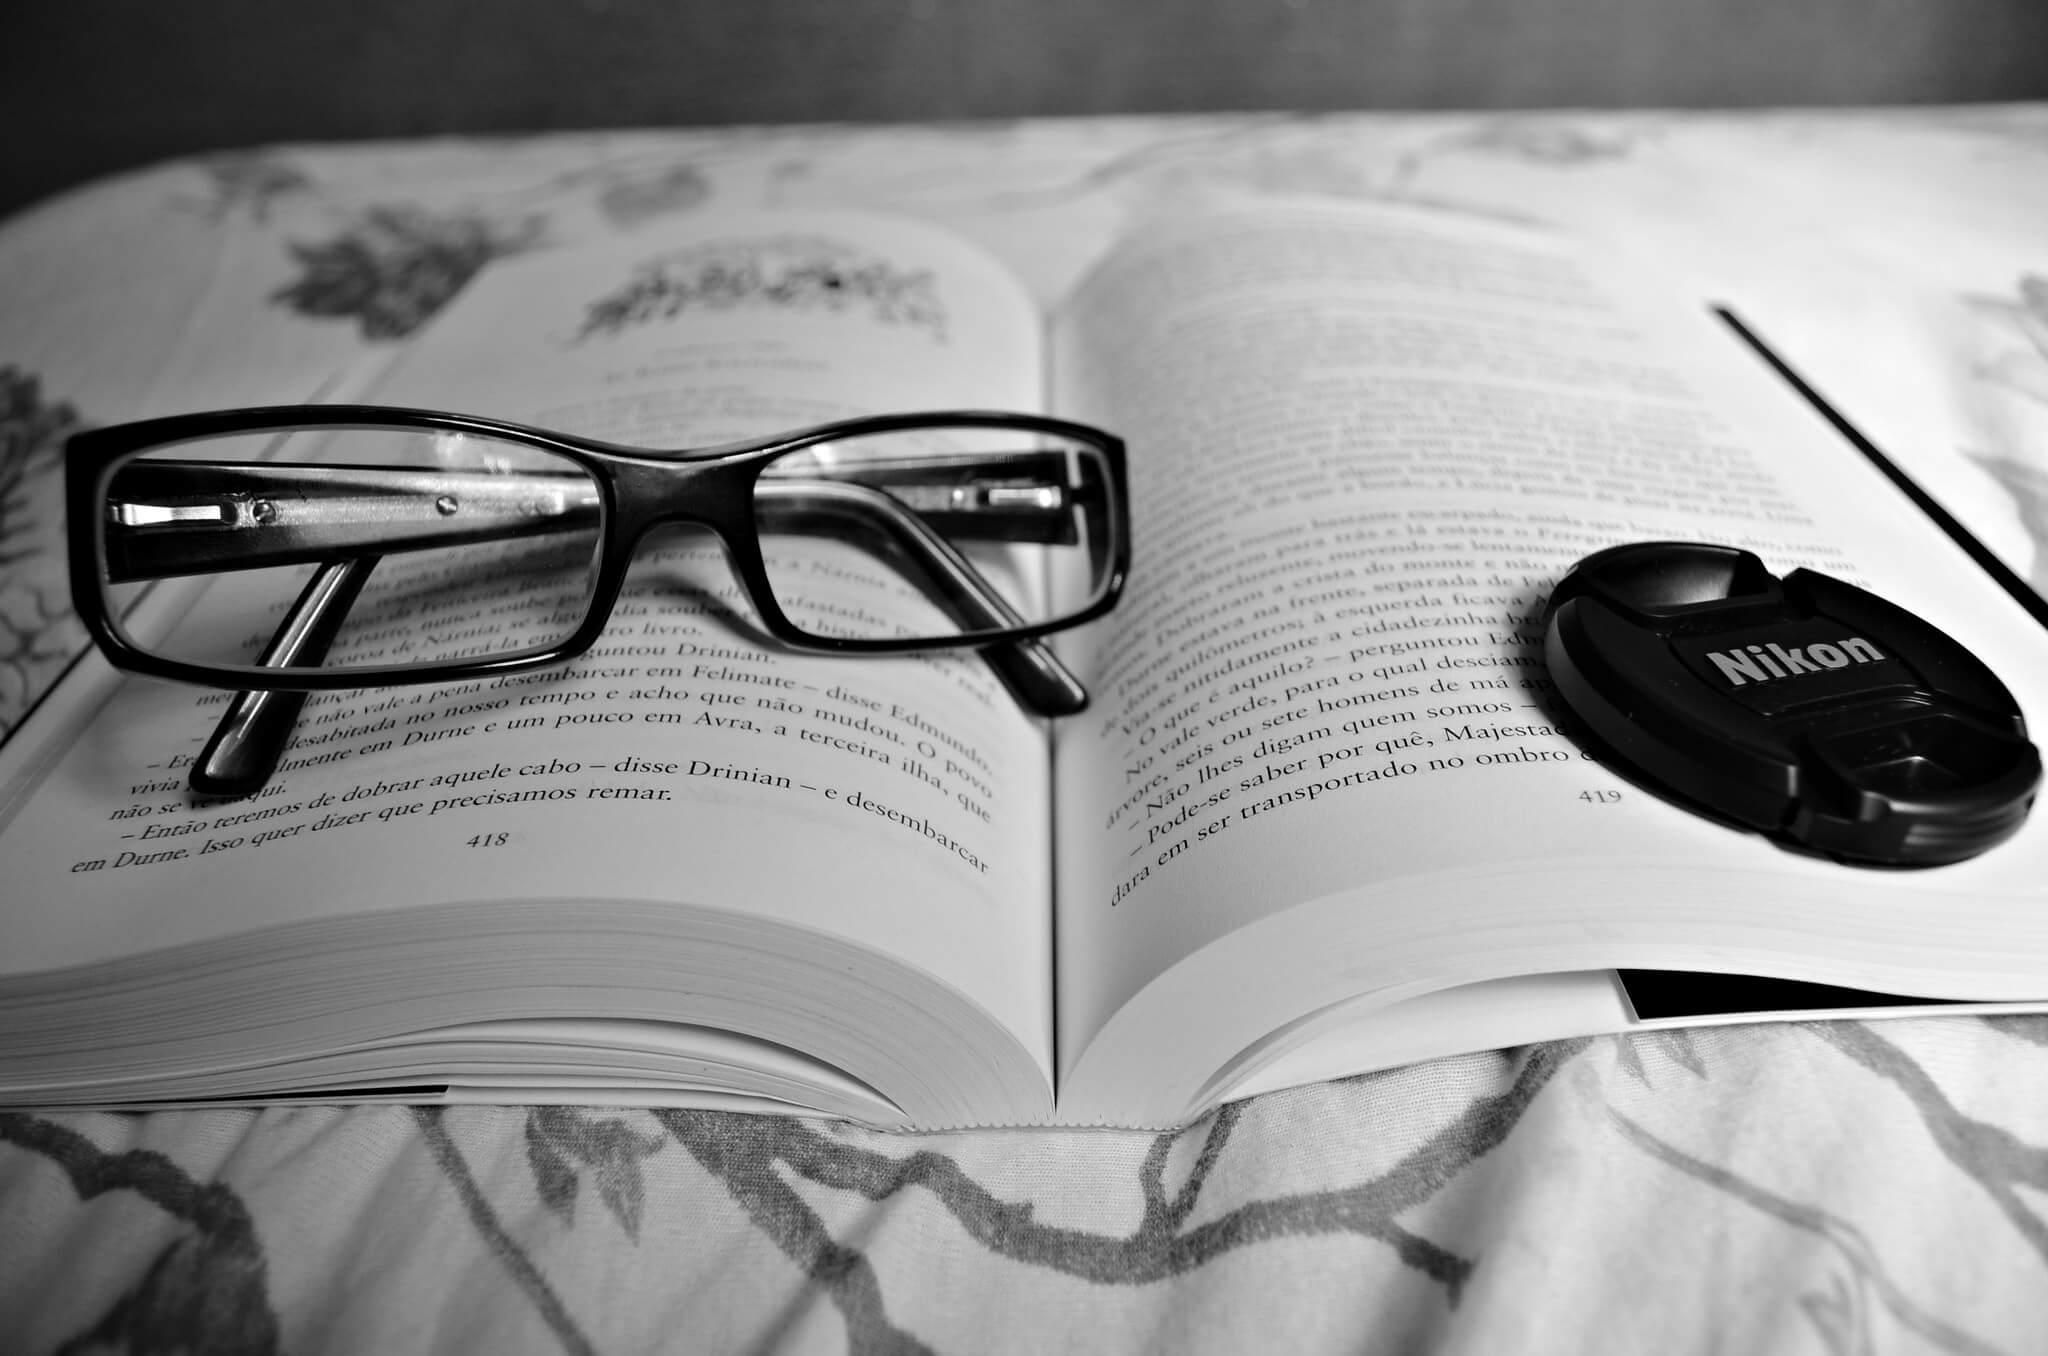 Recenzja książki